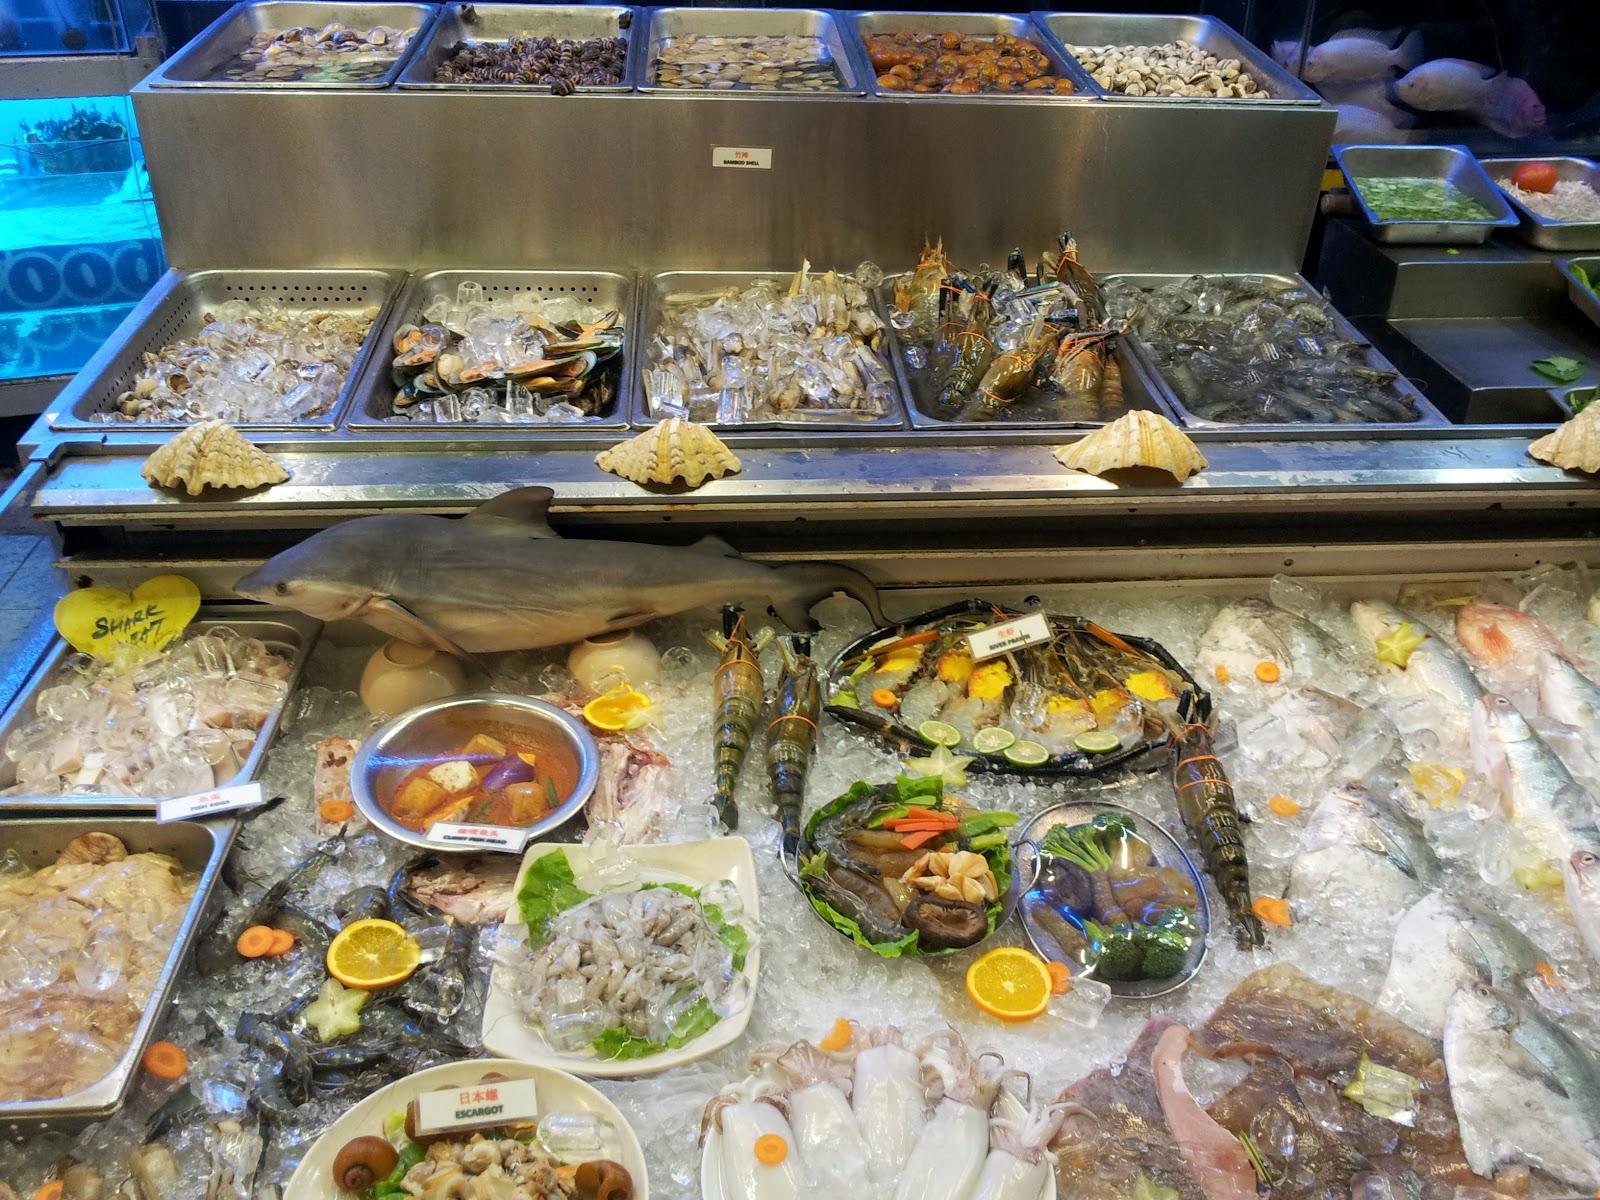 China Doll Seafood Restaurant